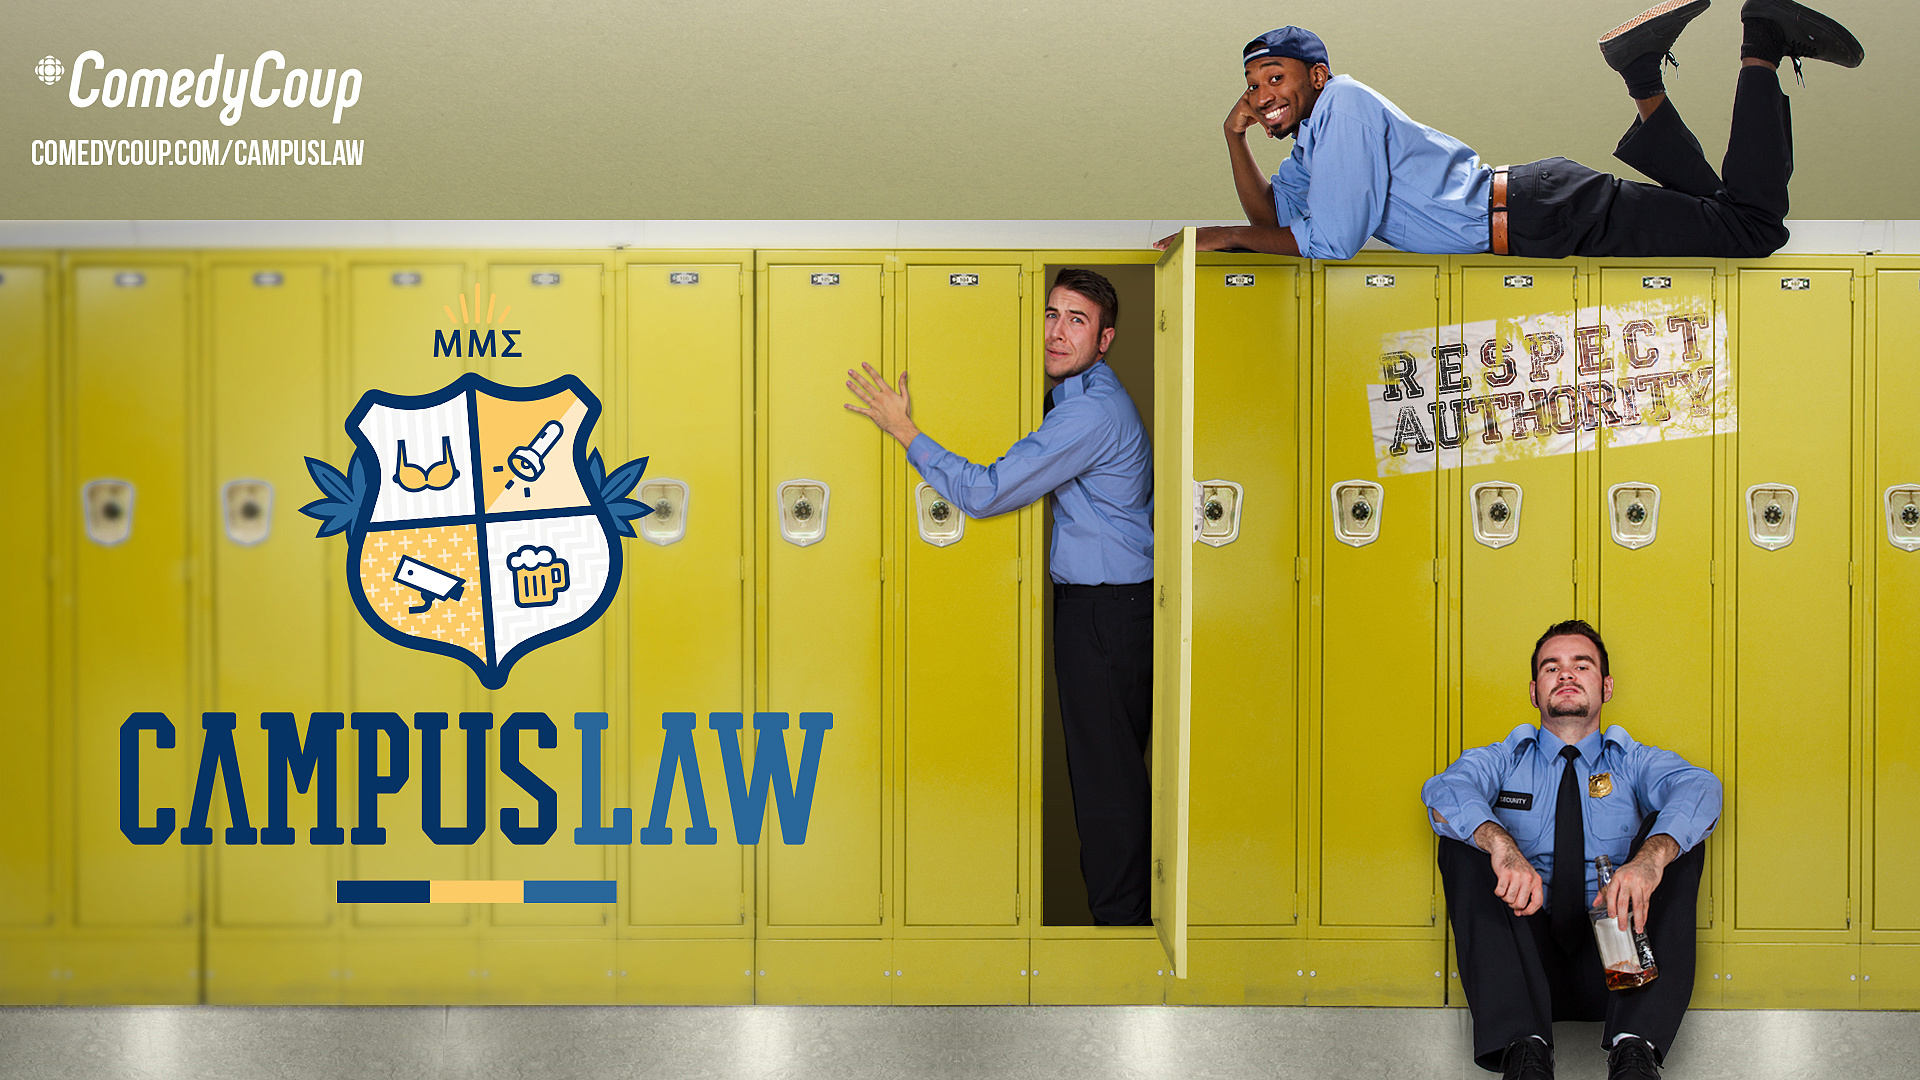 Week 4 Key It: Poster A Campus Law